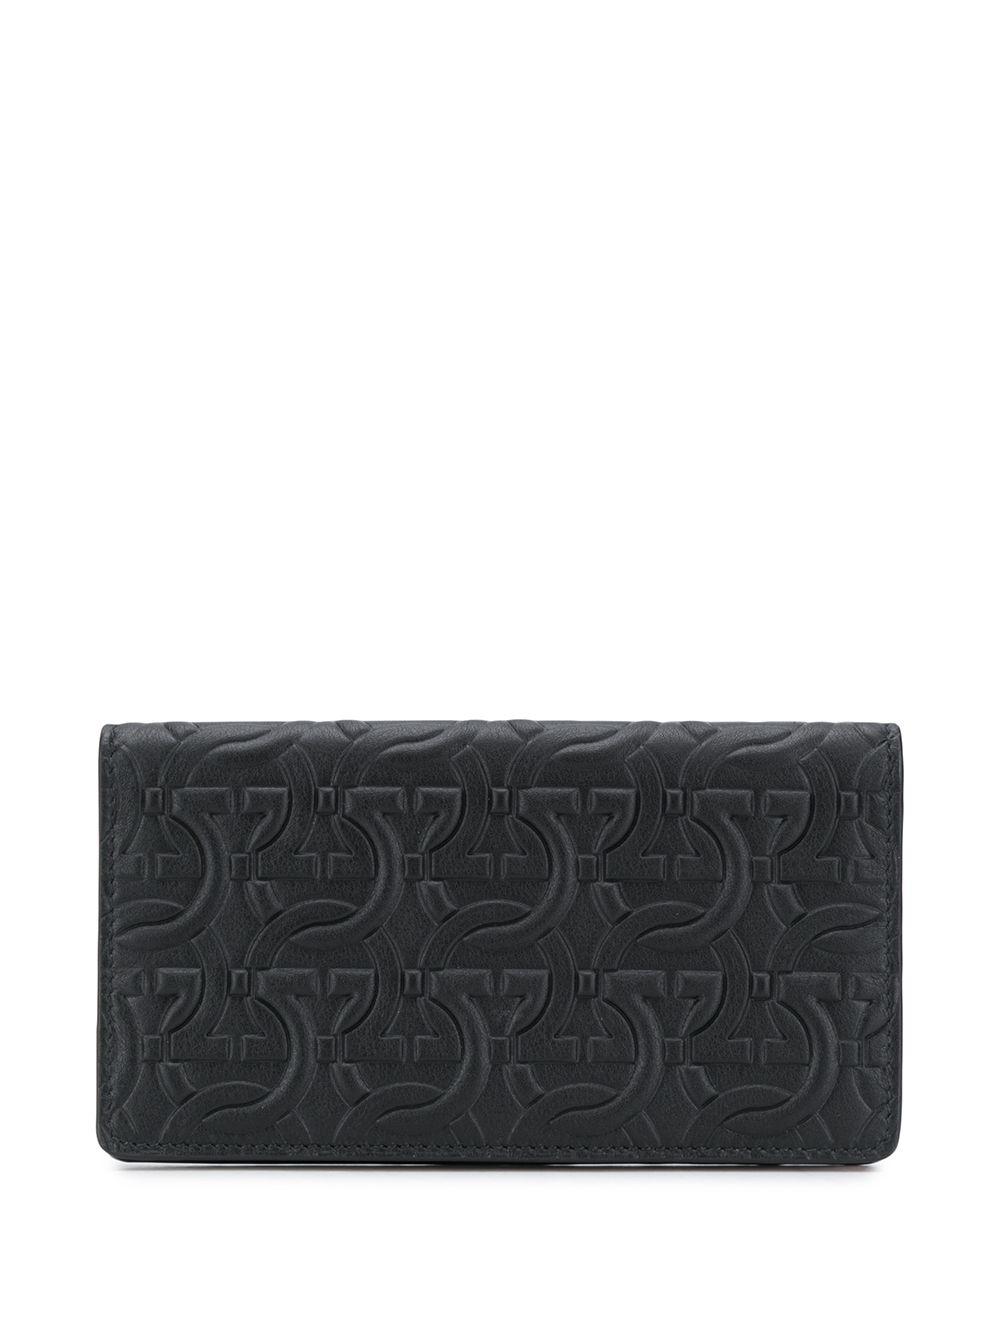 Gancini Leather Wallet